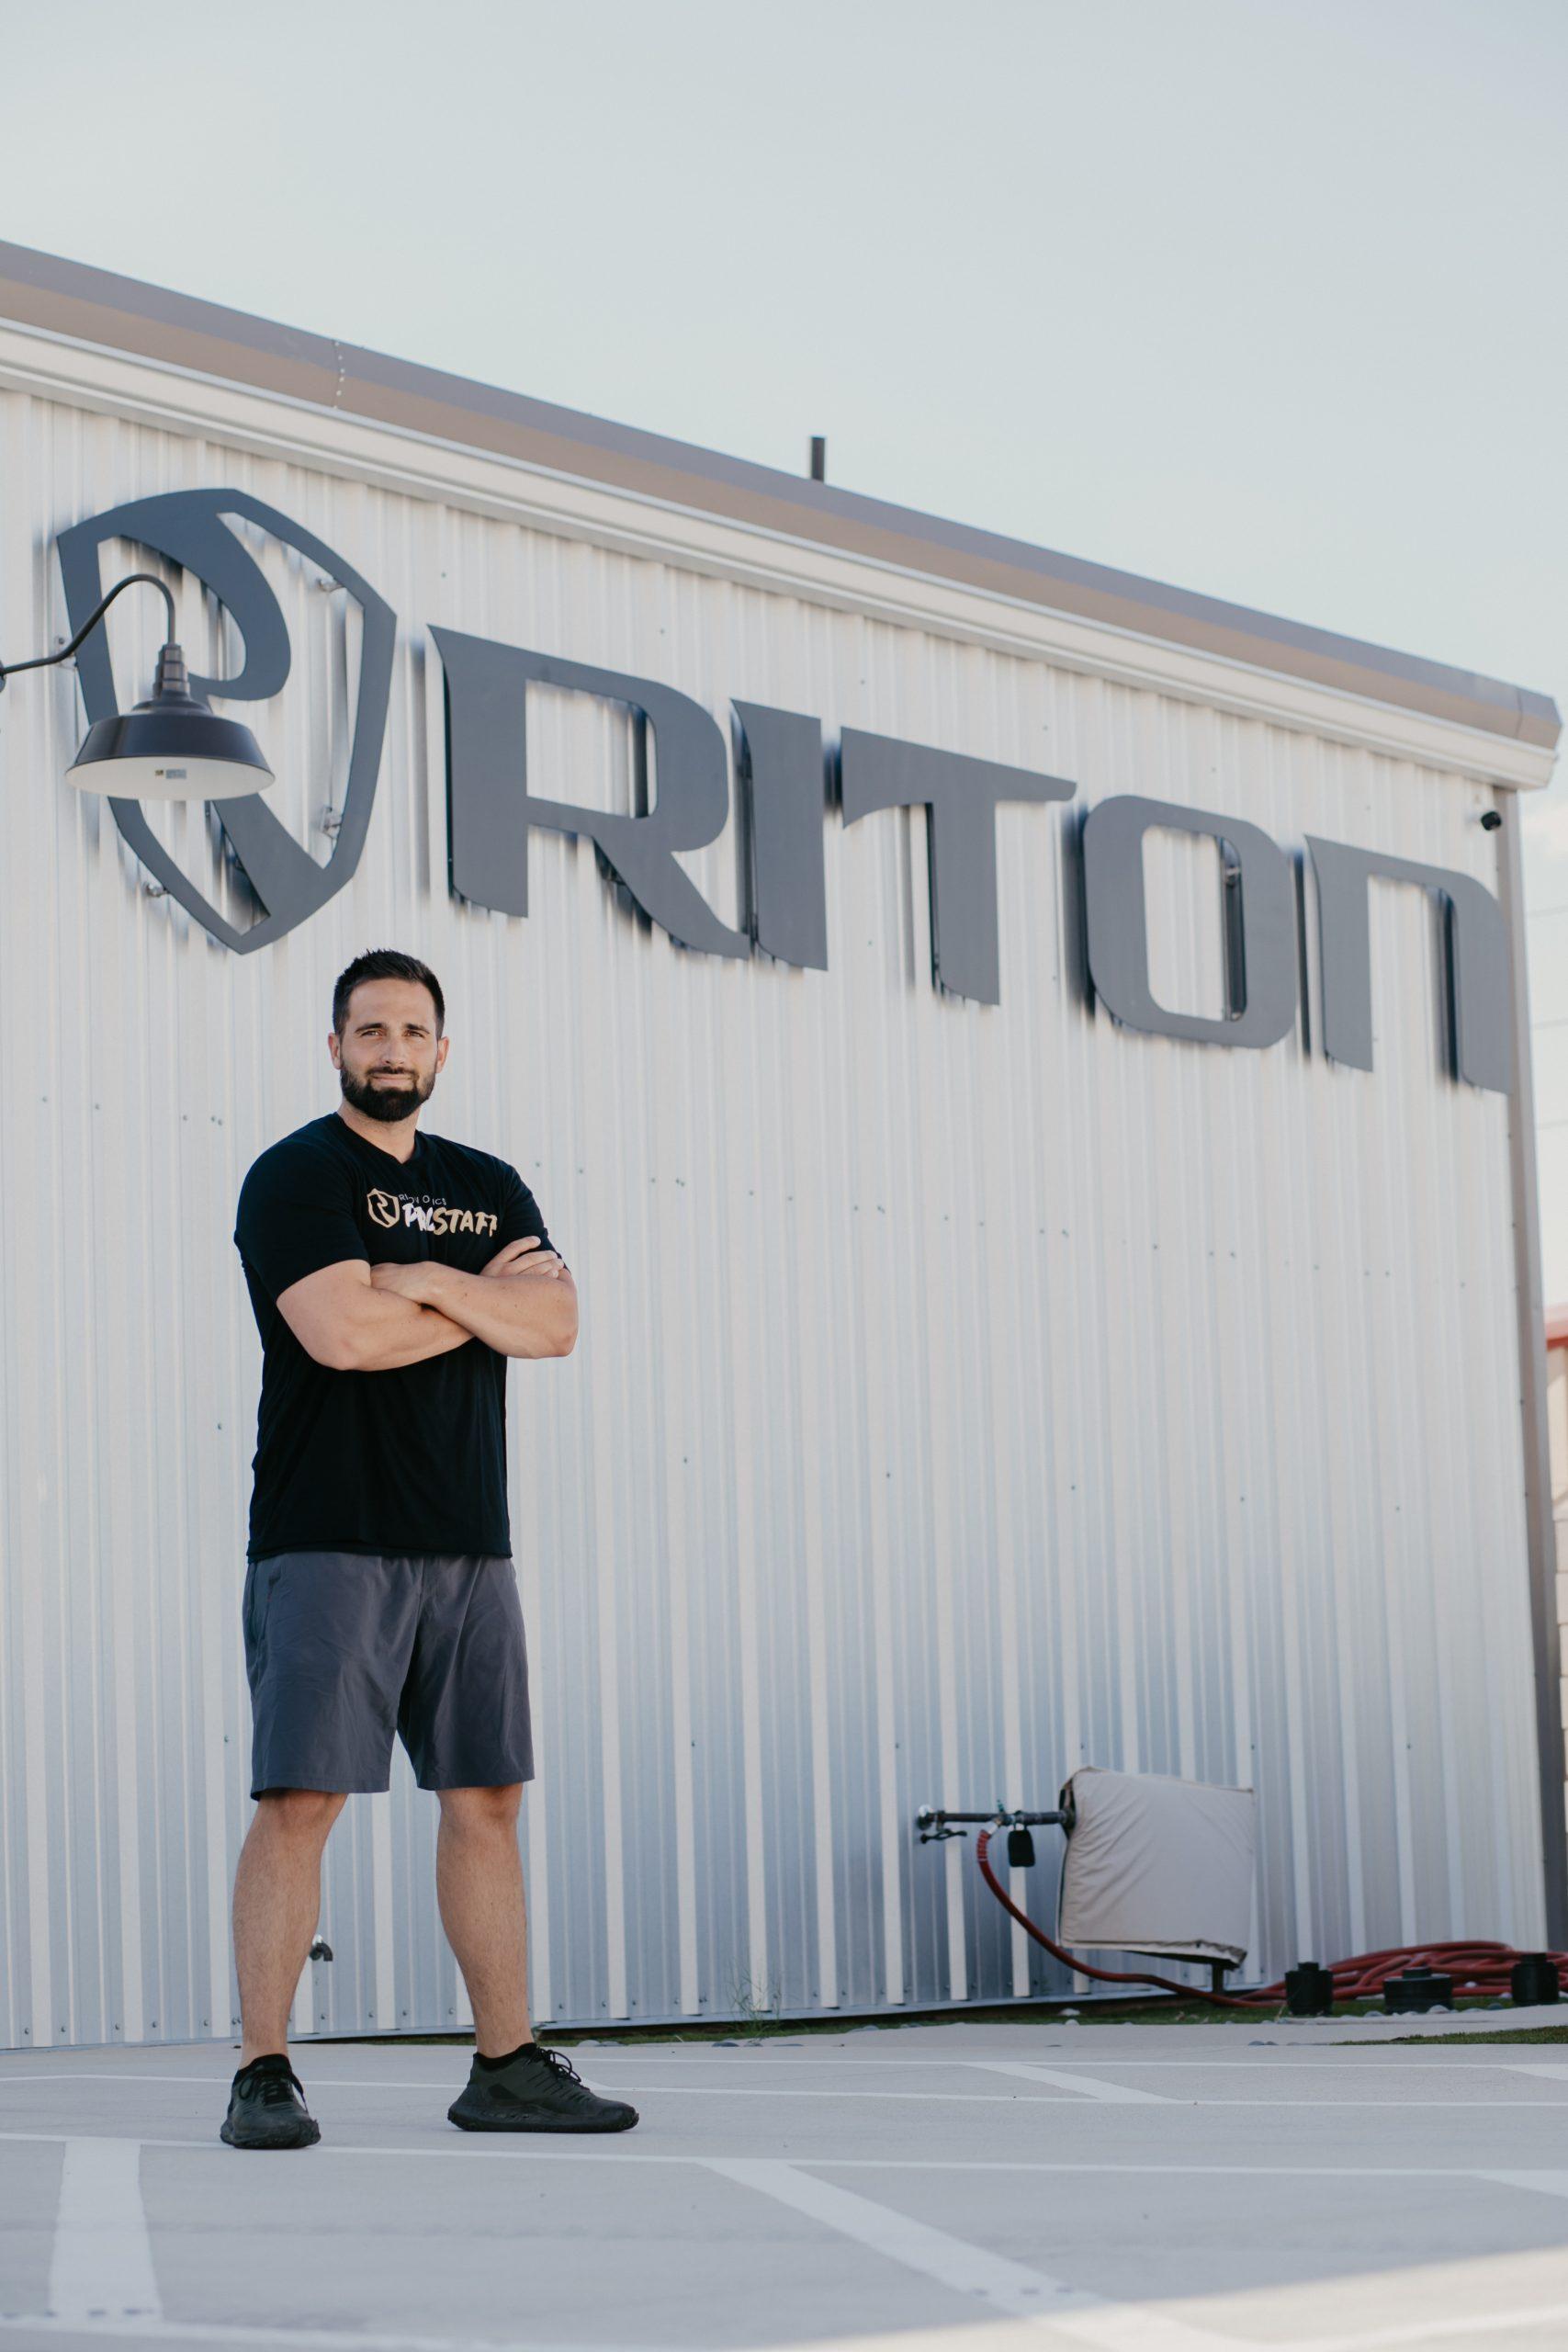 Austin Legg joins Riton Optics